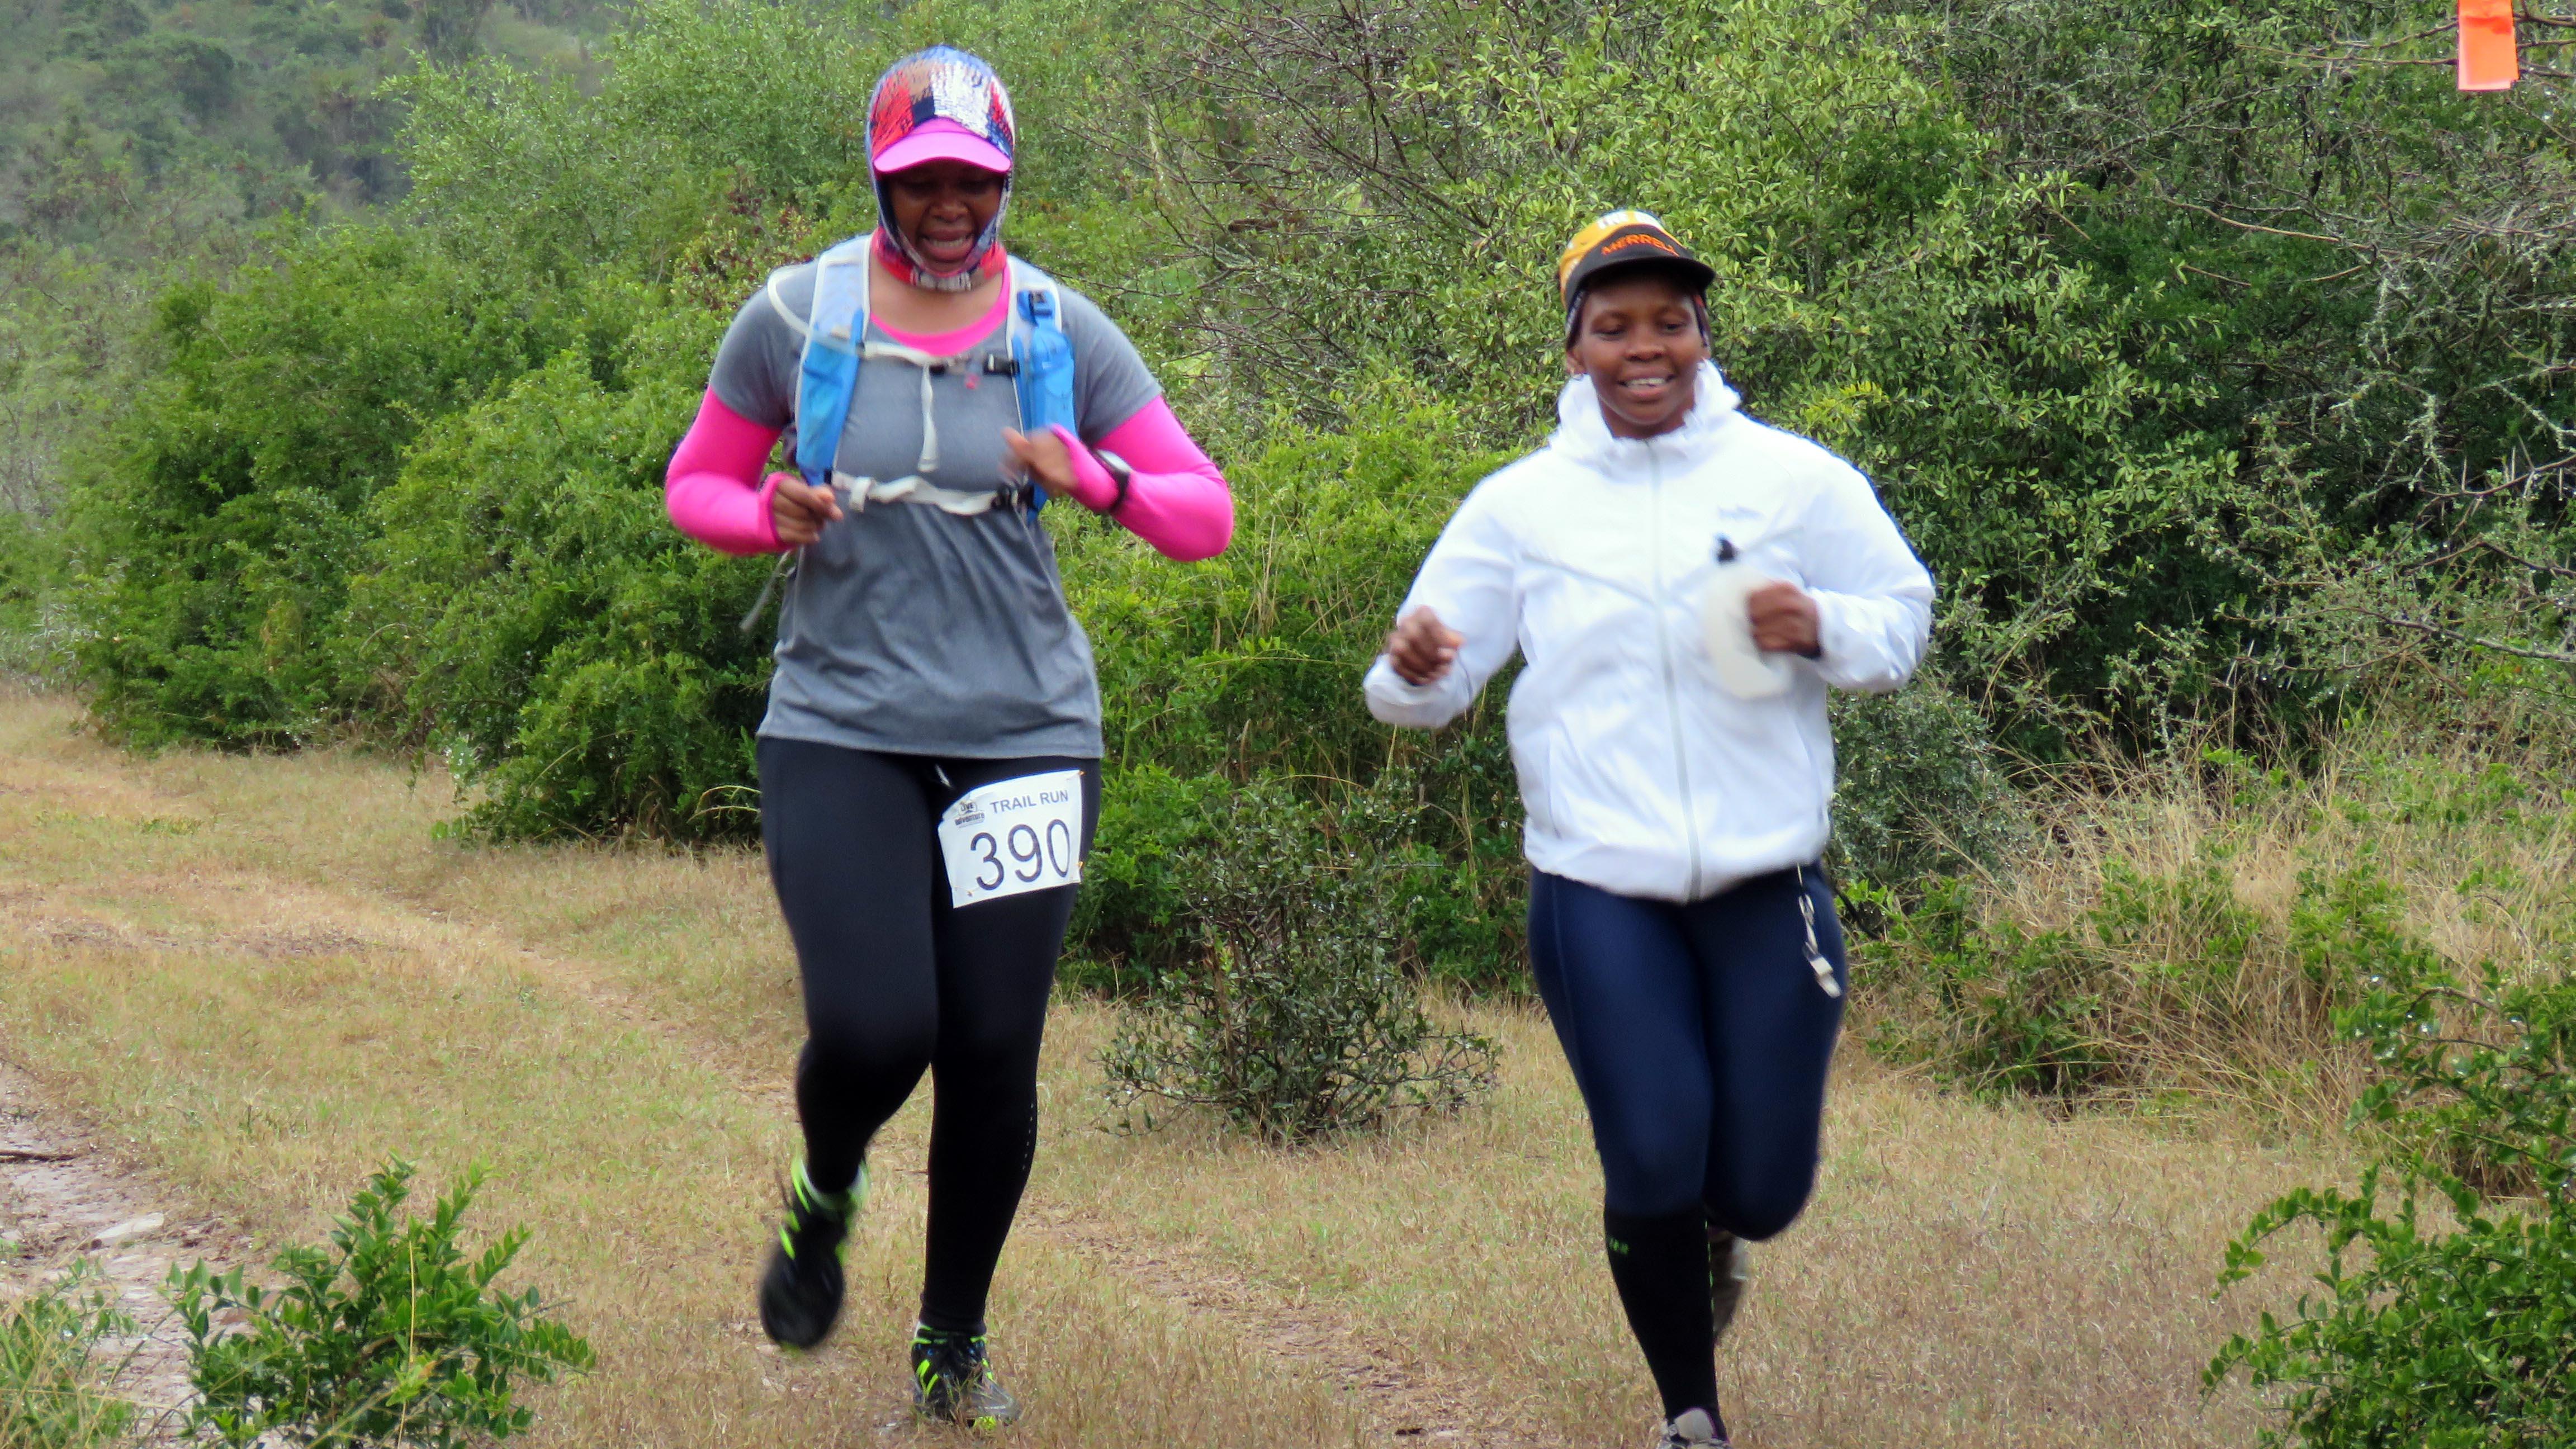 hayterdale trailrun 2018-08-05  (26)